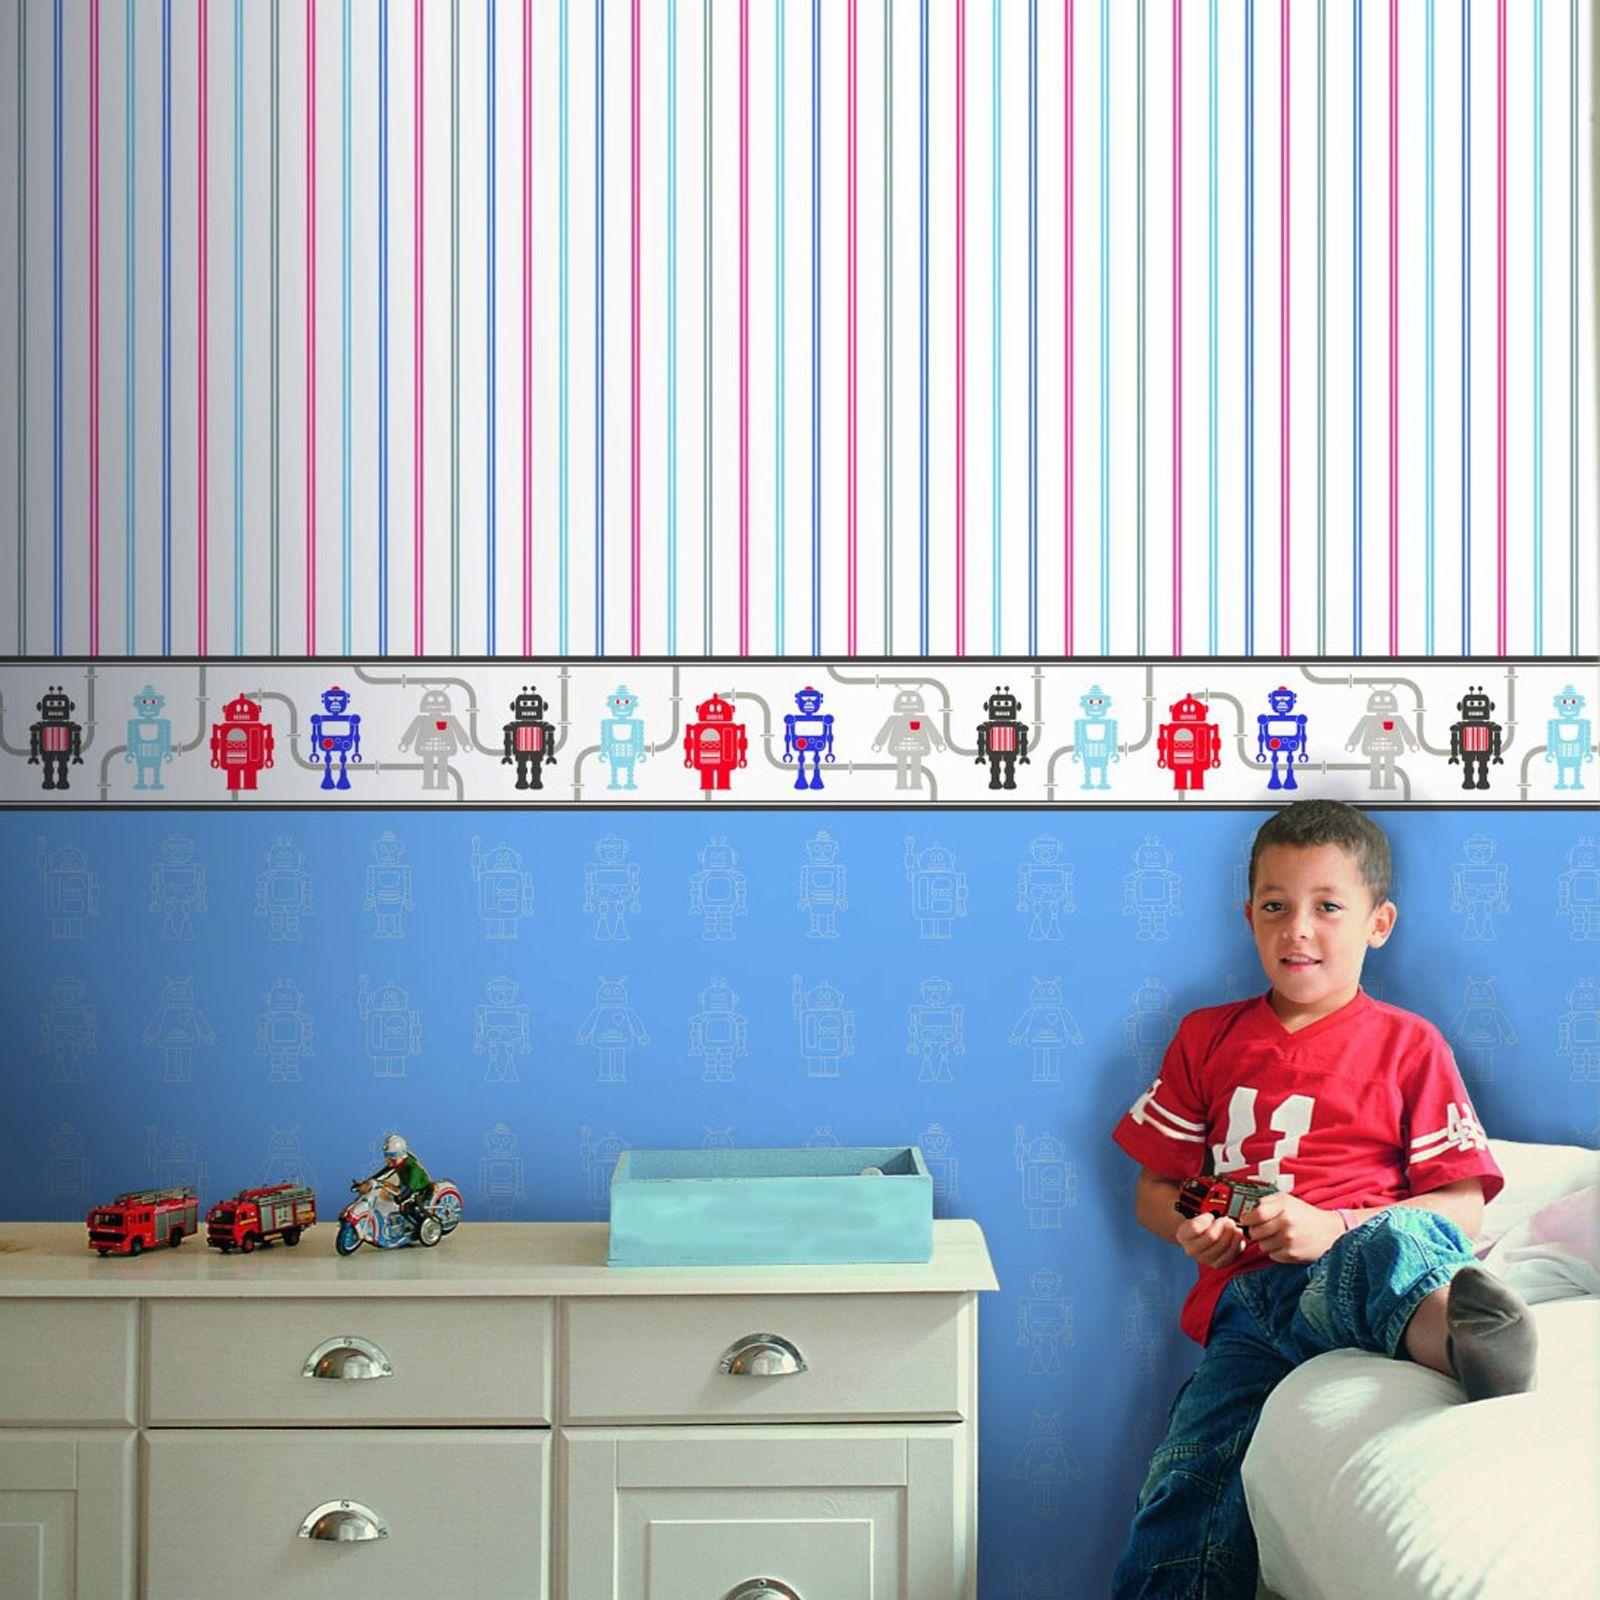 wallpaper cars bedroom borders wall themed itm decor kids dinosaur for space boys